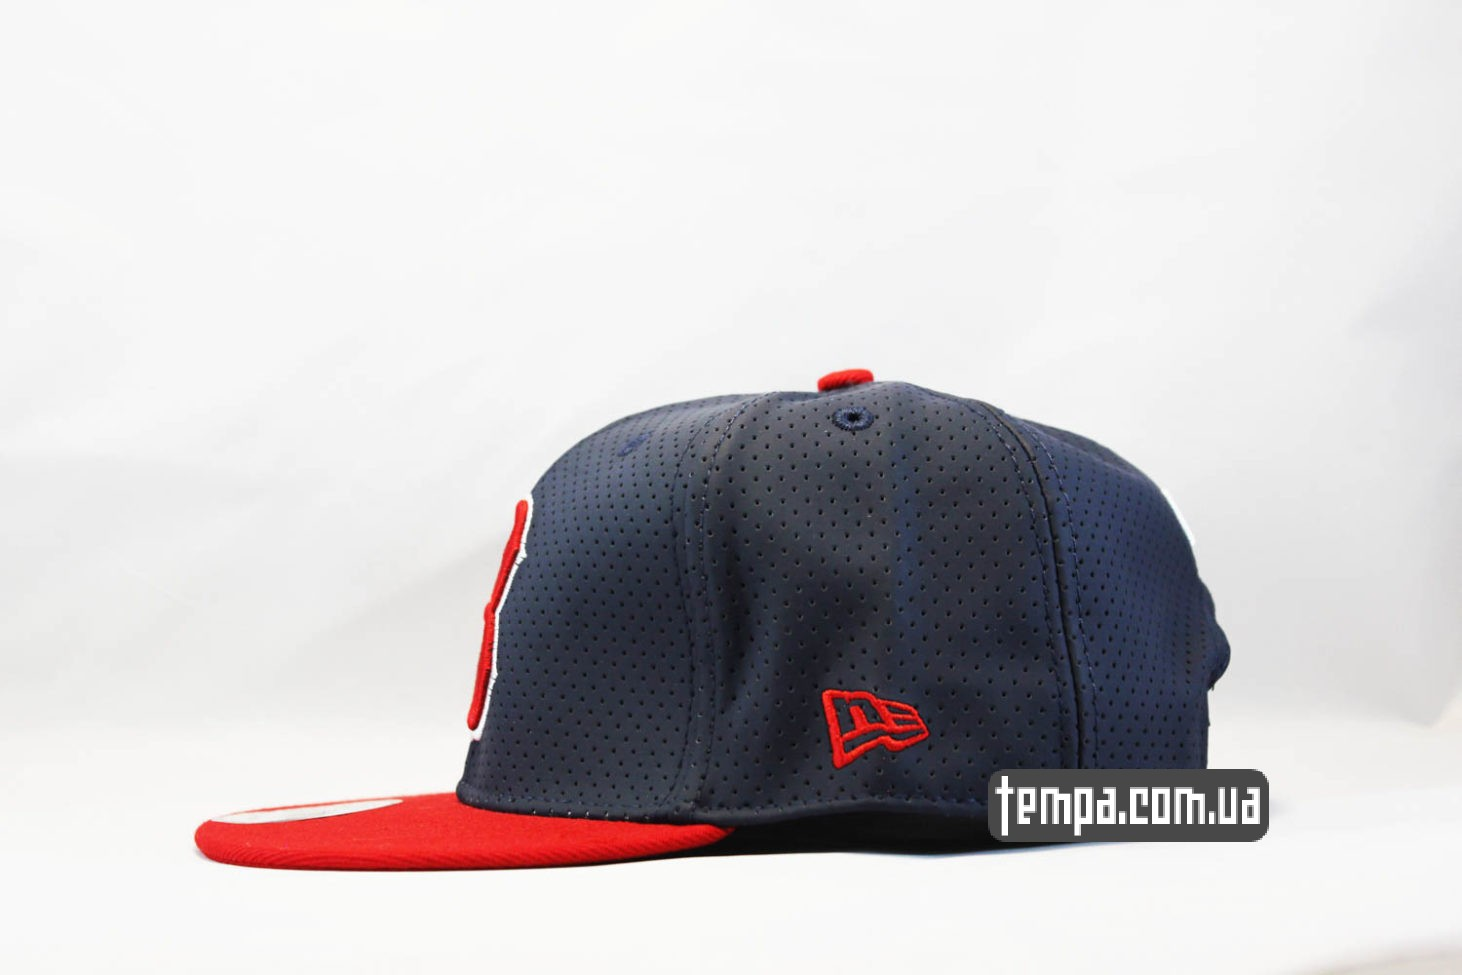 бостон бейсбольная команда кепка snapback boston redsox NEW ERA trucker с сеткой